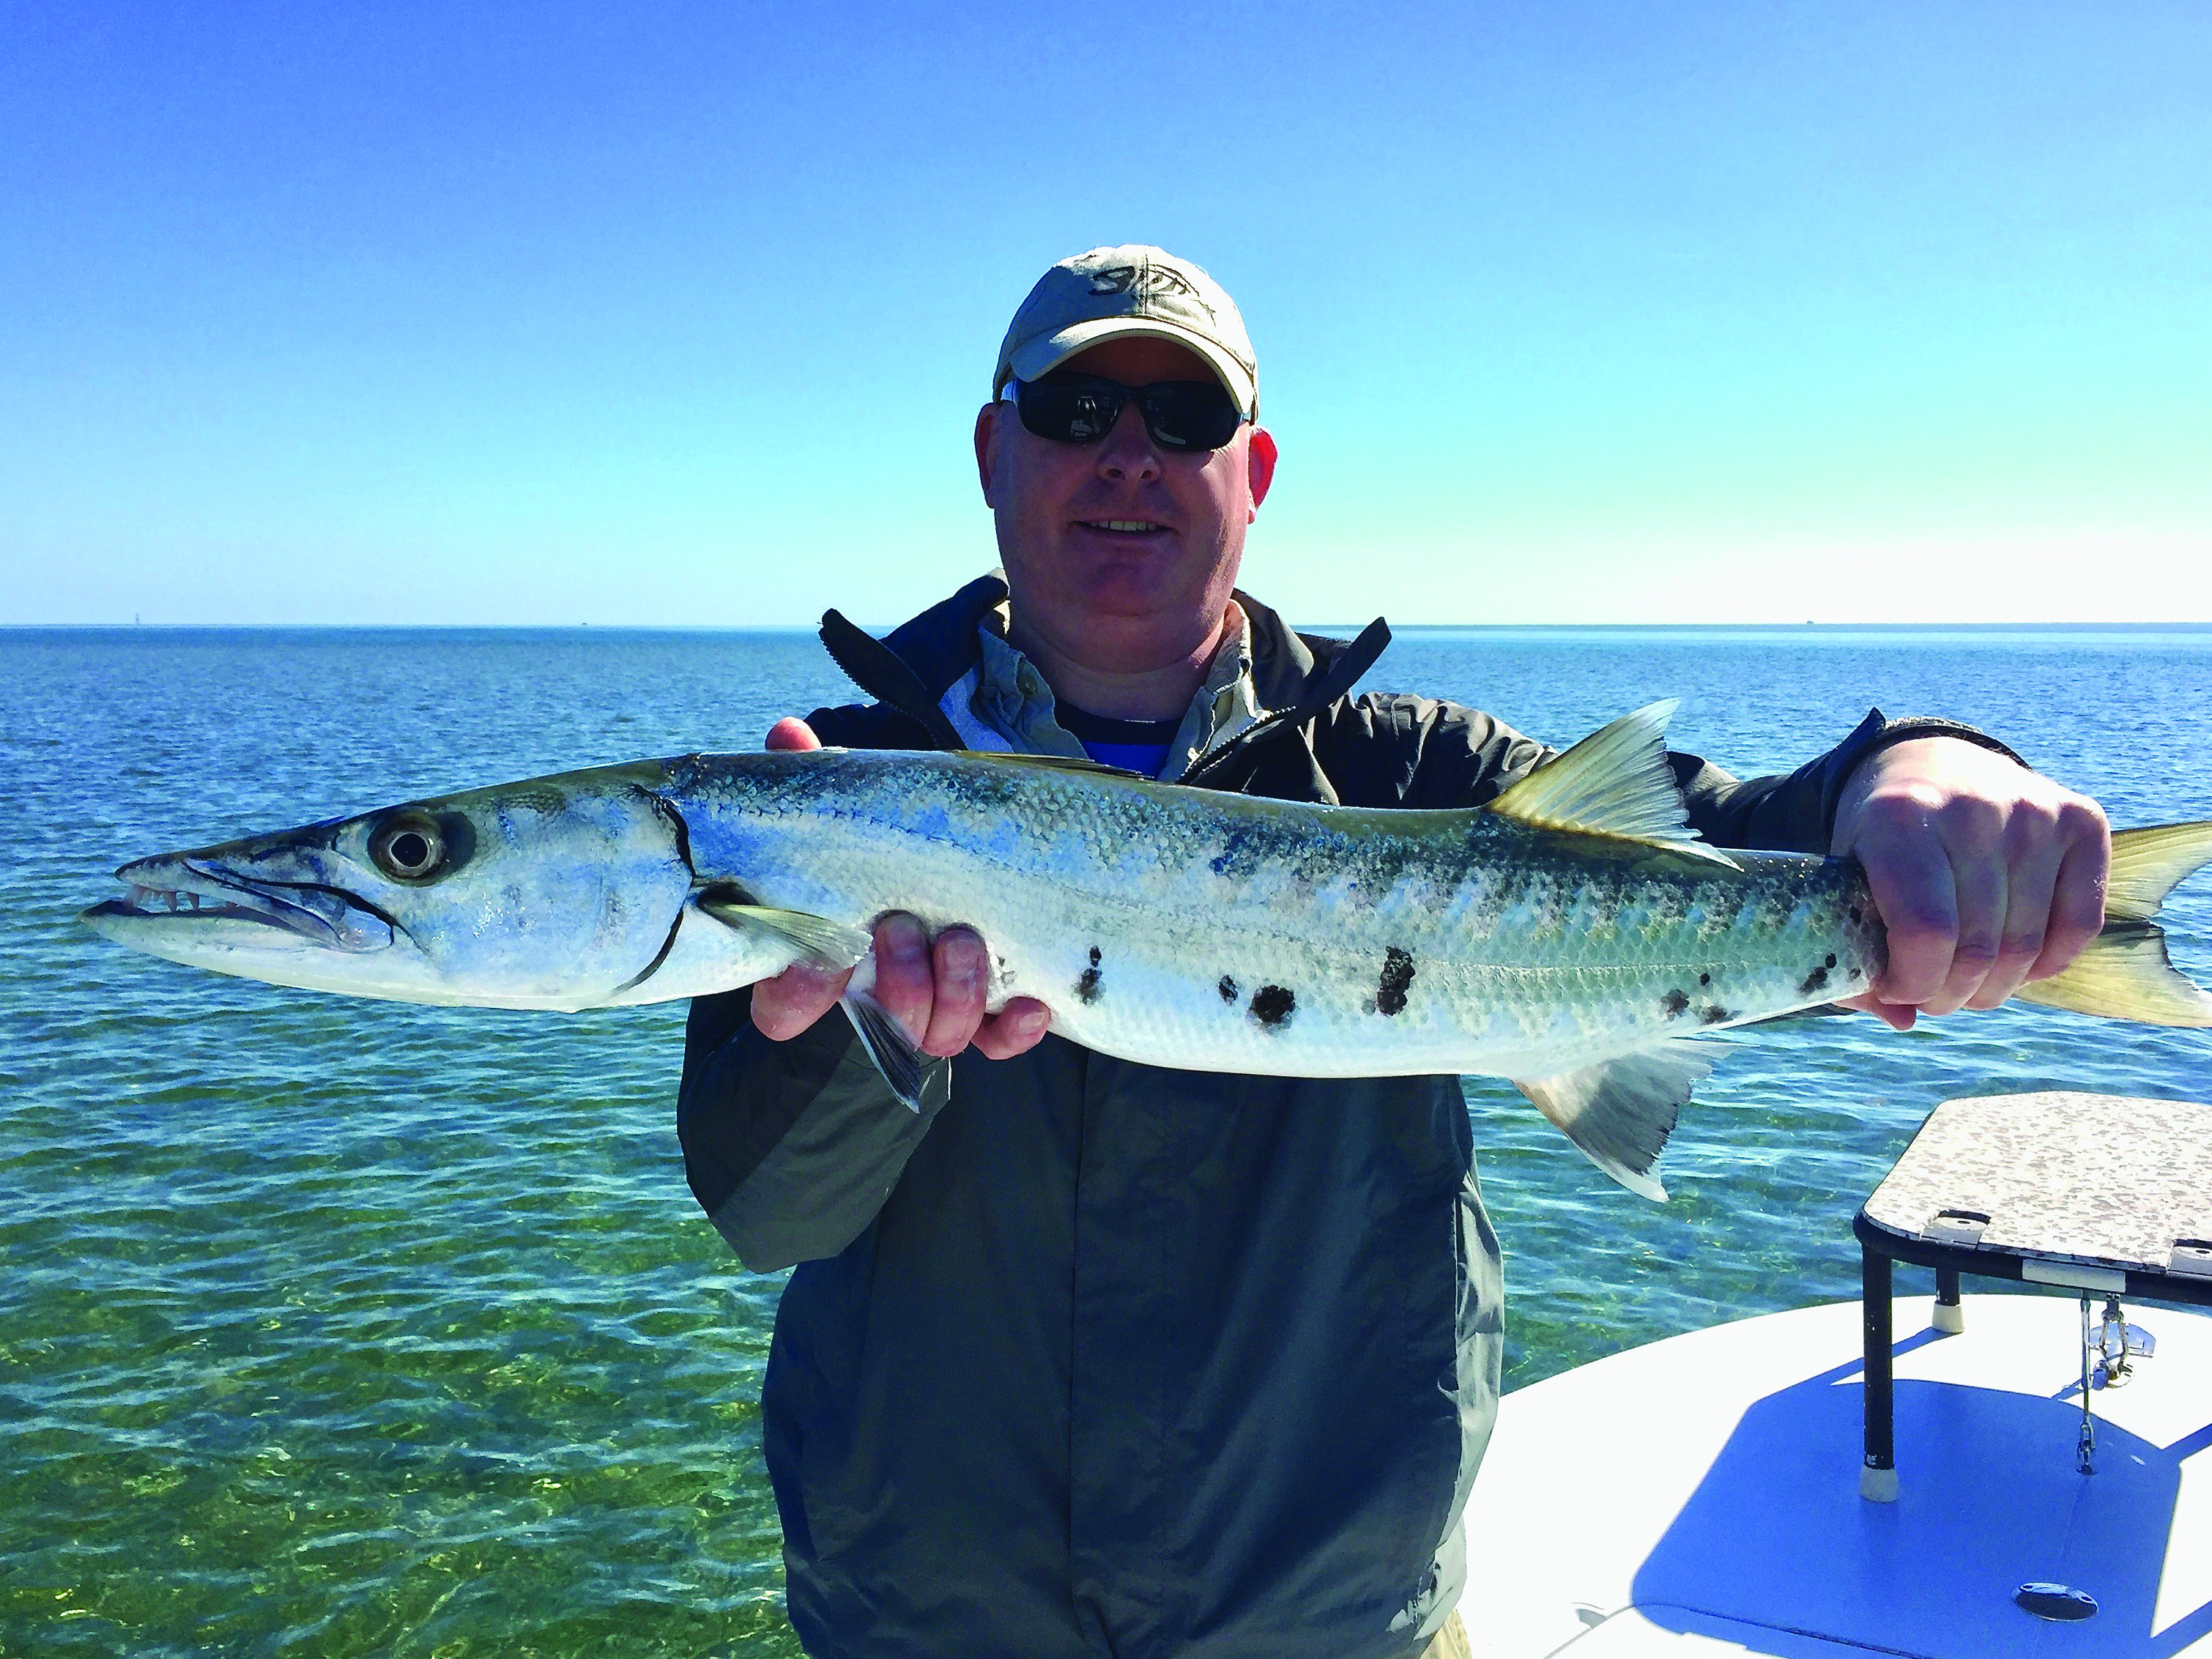 Winter fishing in miami s biscayne bay coastal angler for Fishing in miami